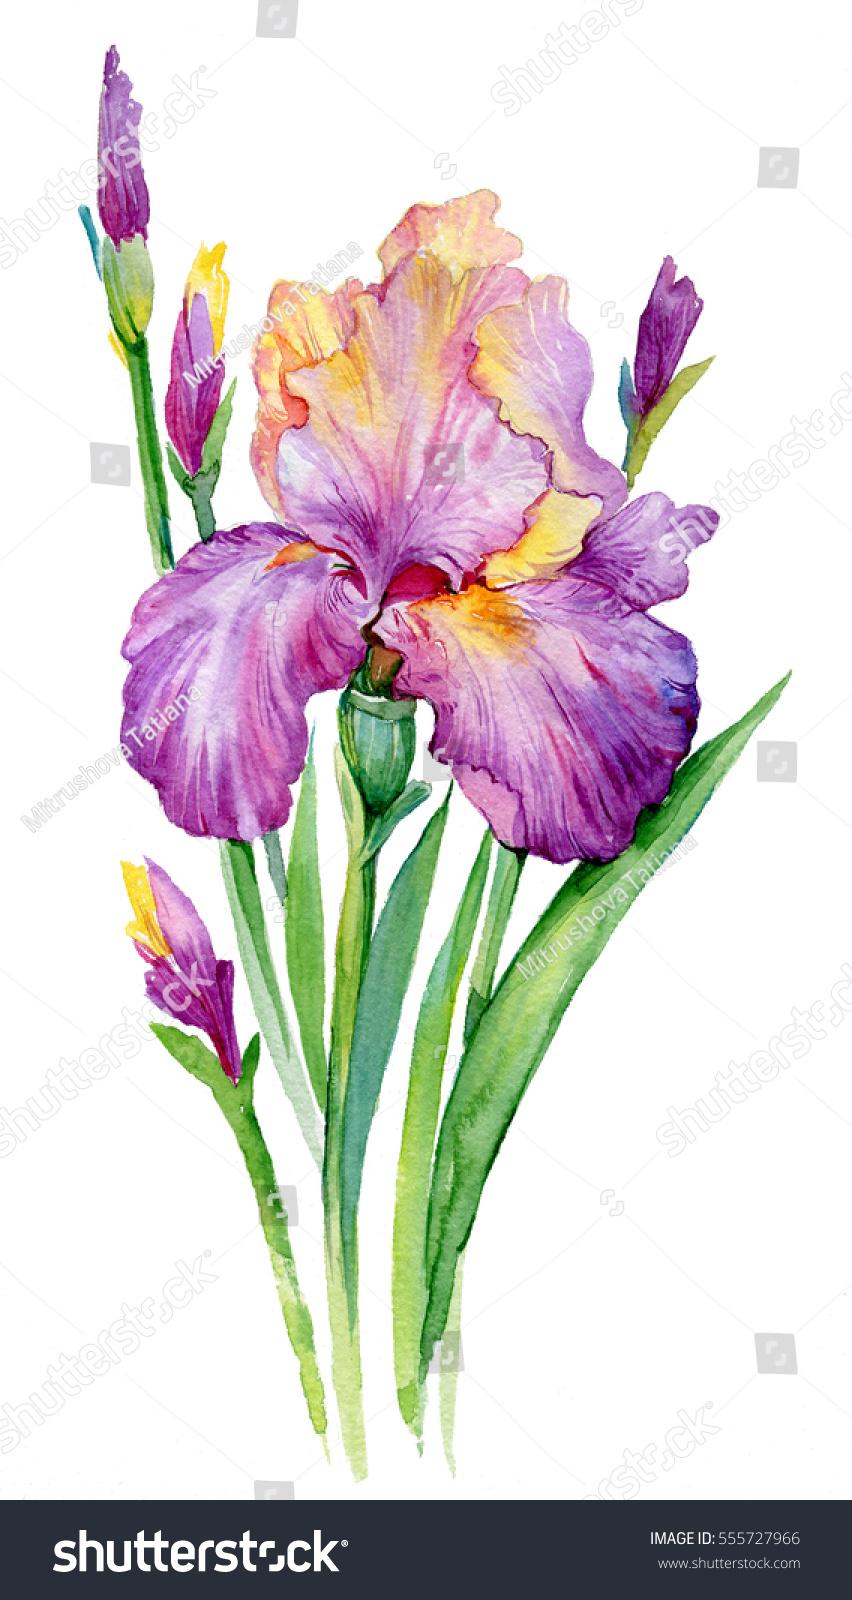 Purple iris illustration watercolor iris flower stock illustration purple iris illustration watercolor iris flower isolated on white background biocorpaavc